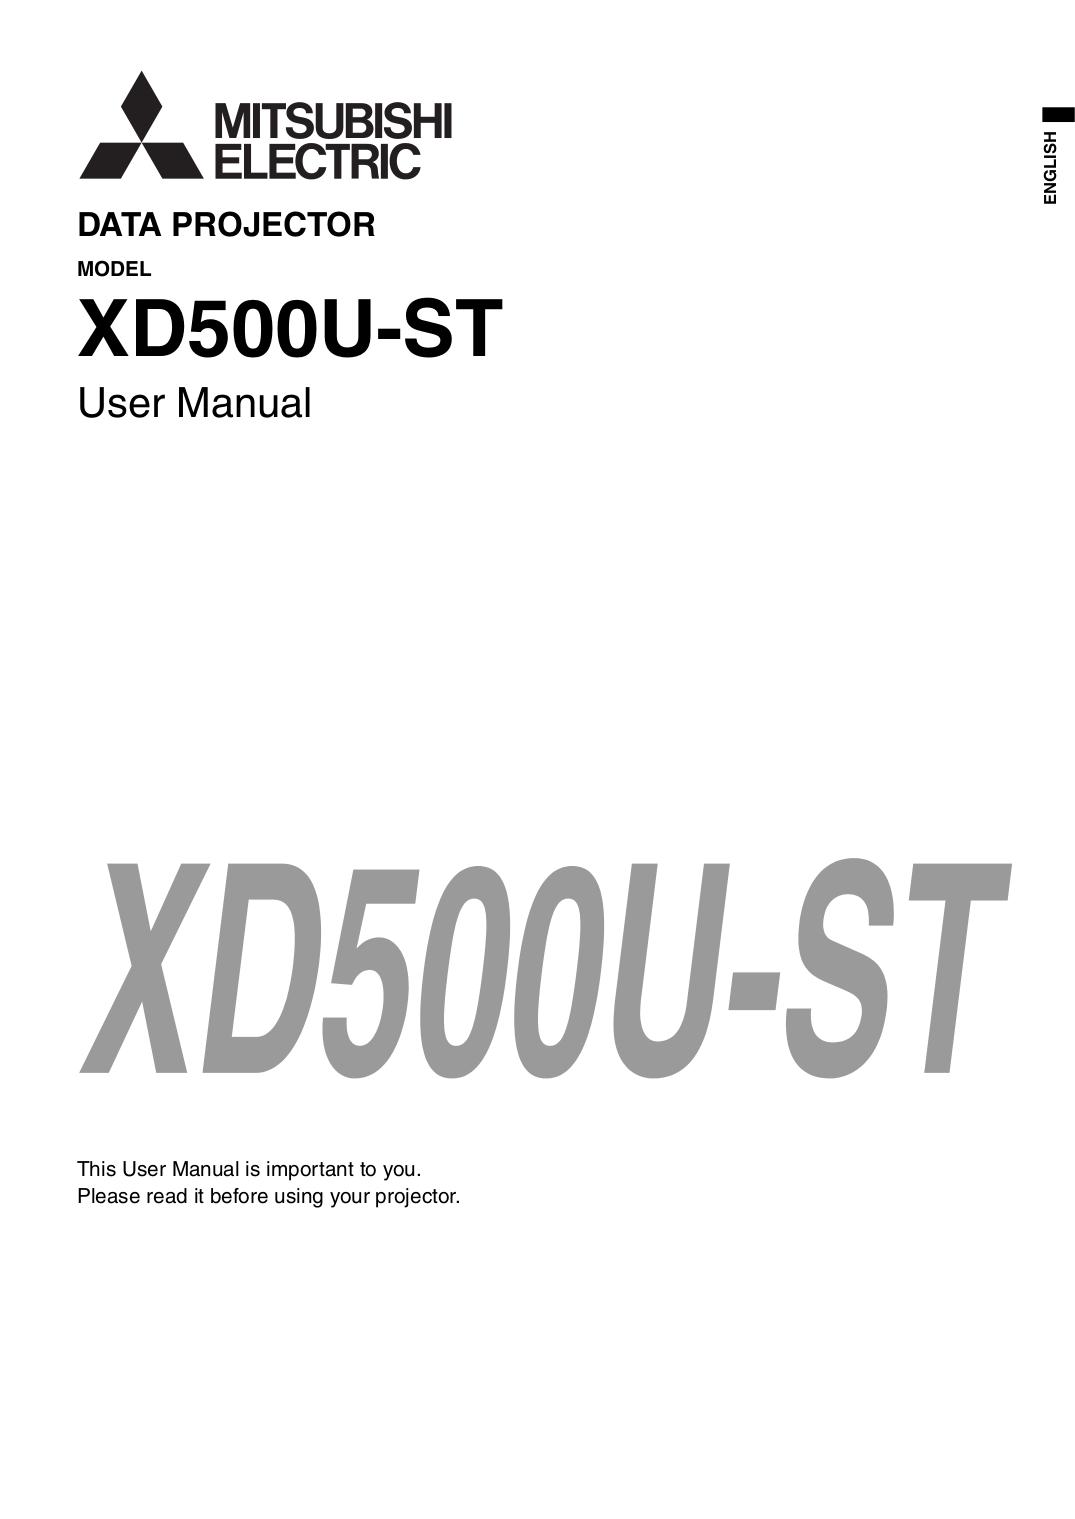 Download free pdf for Mitsubishi X250 Projector manual